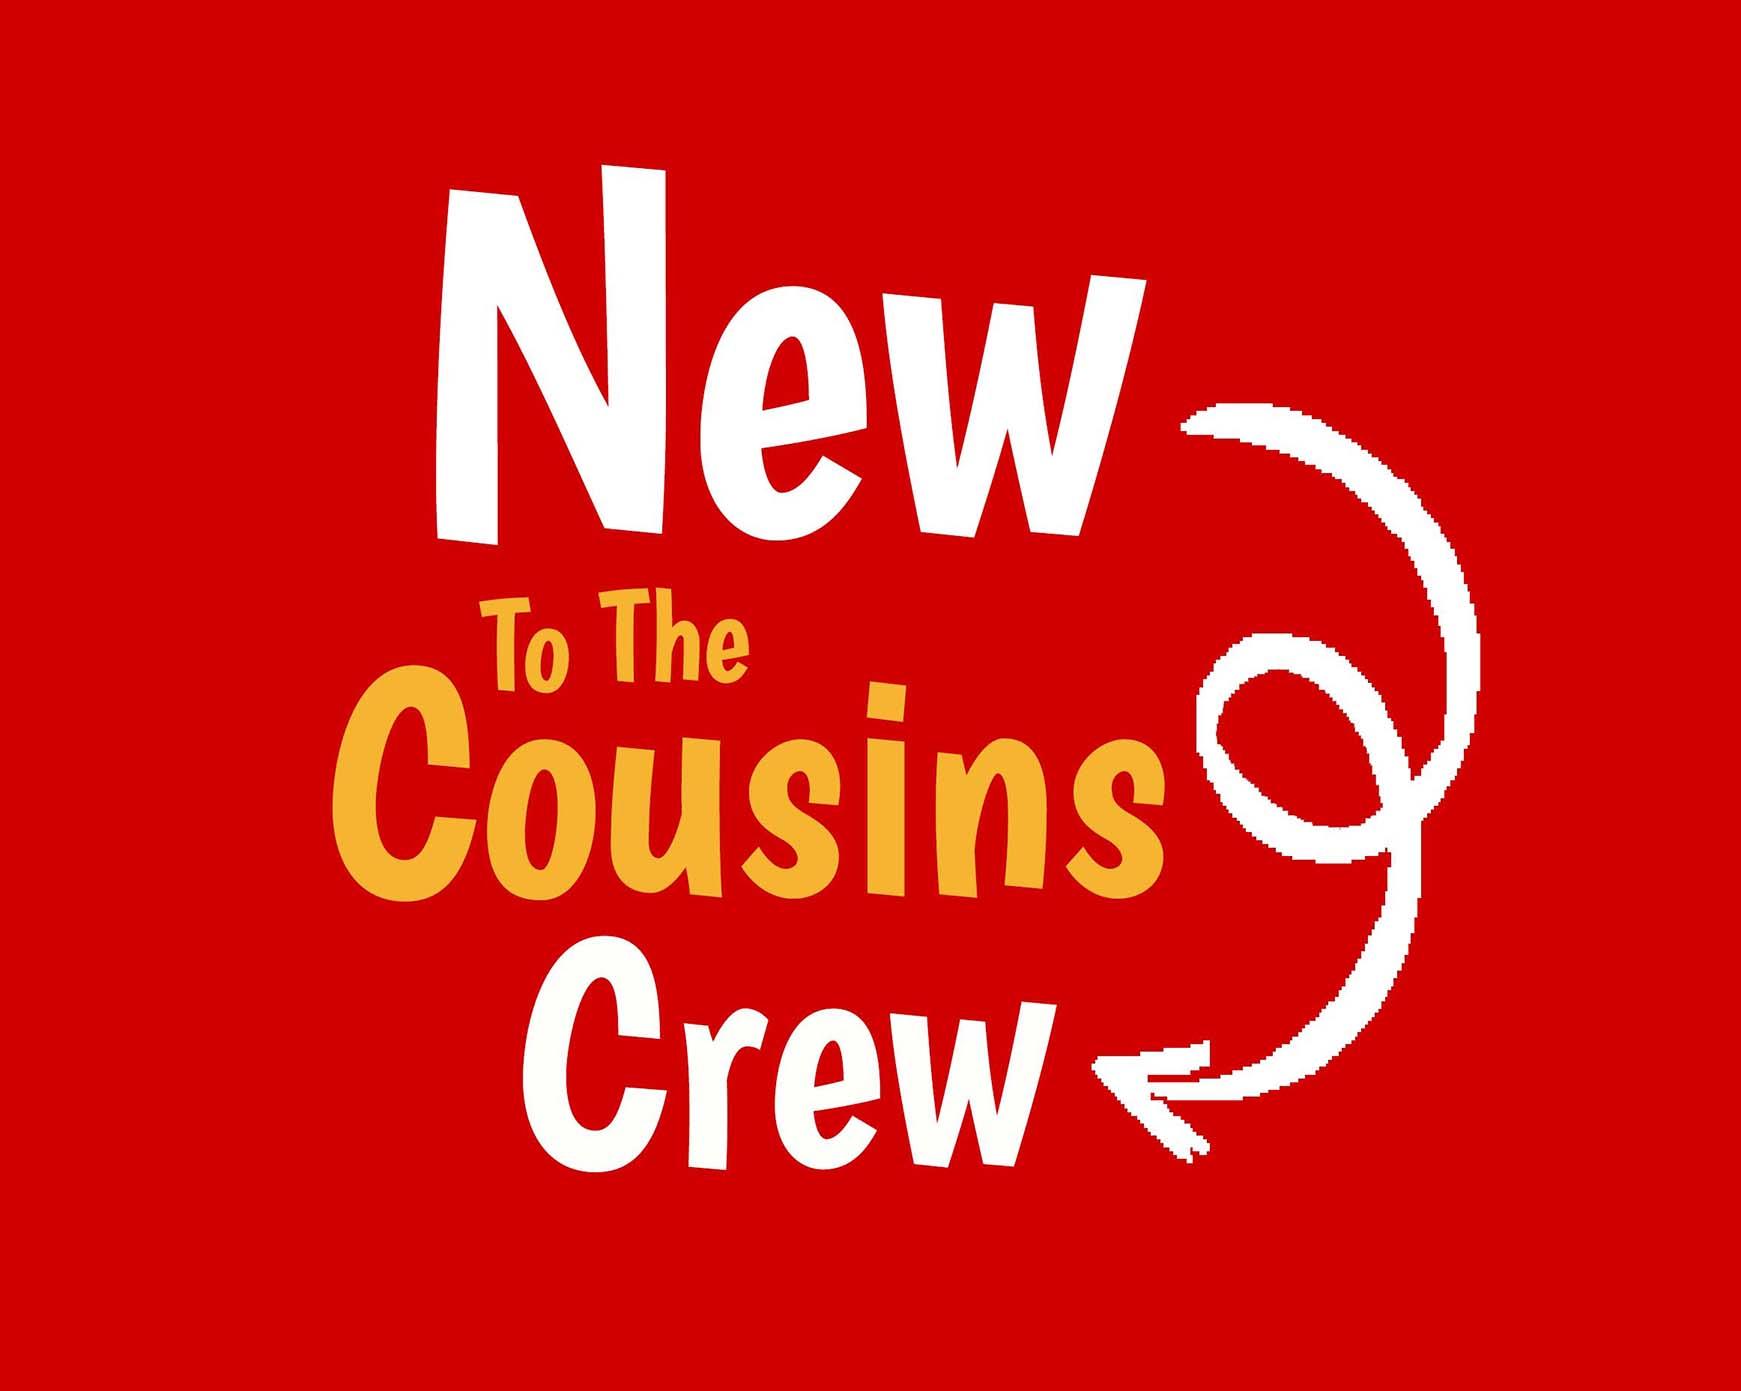 238-Cousins-Crew.jpg